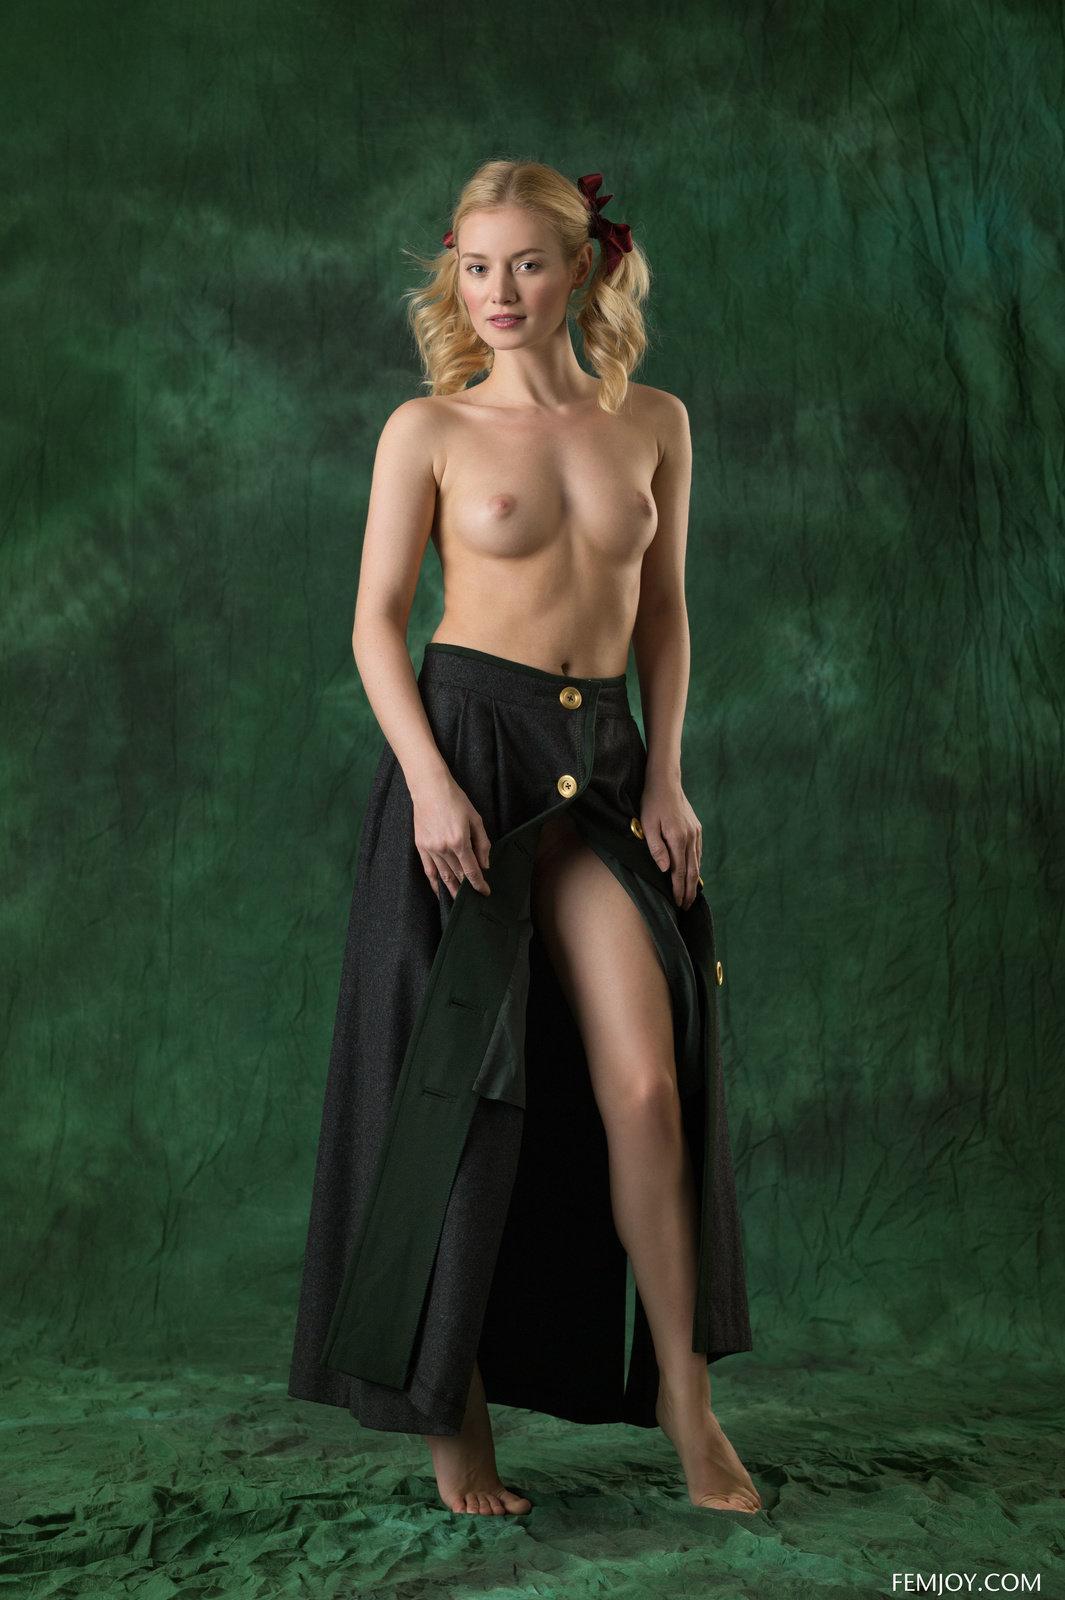 Gabi from Femjoy getting naked in studio shots (16 photos ...